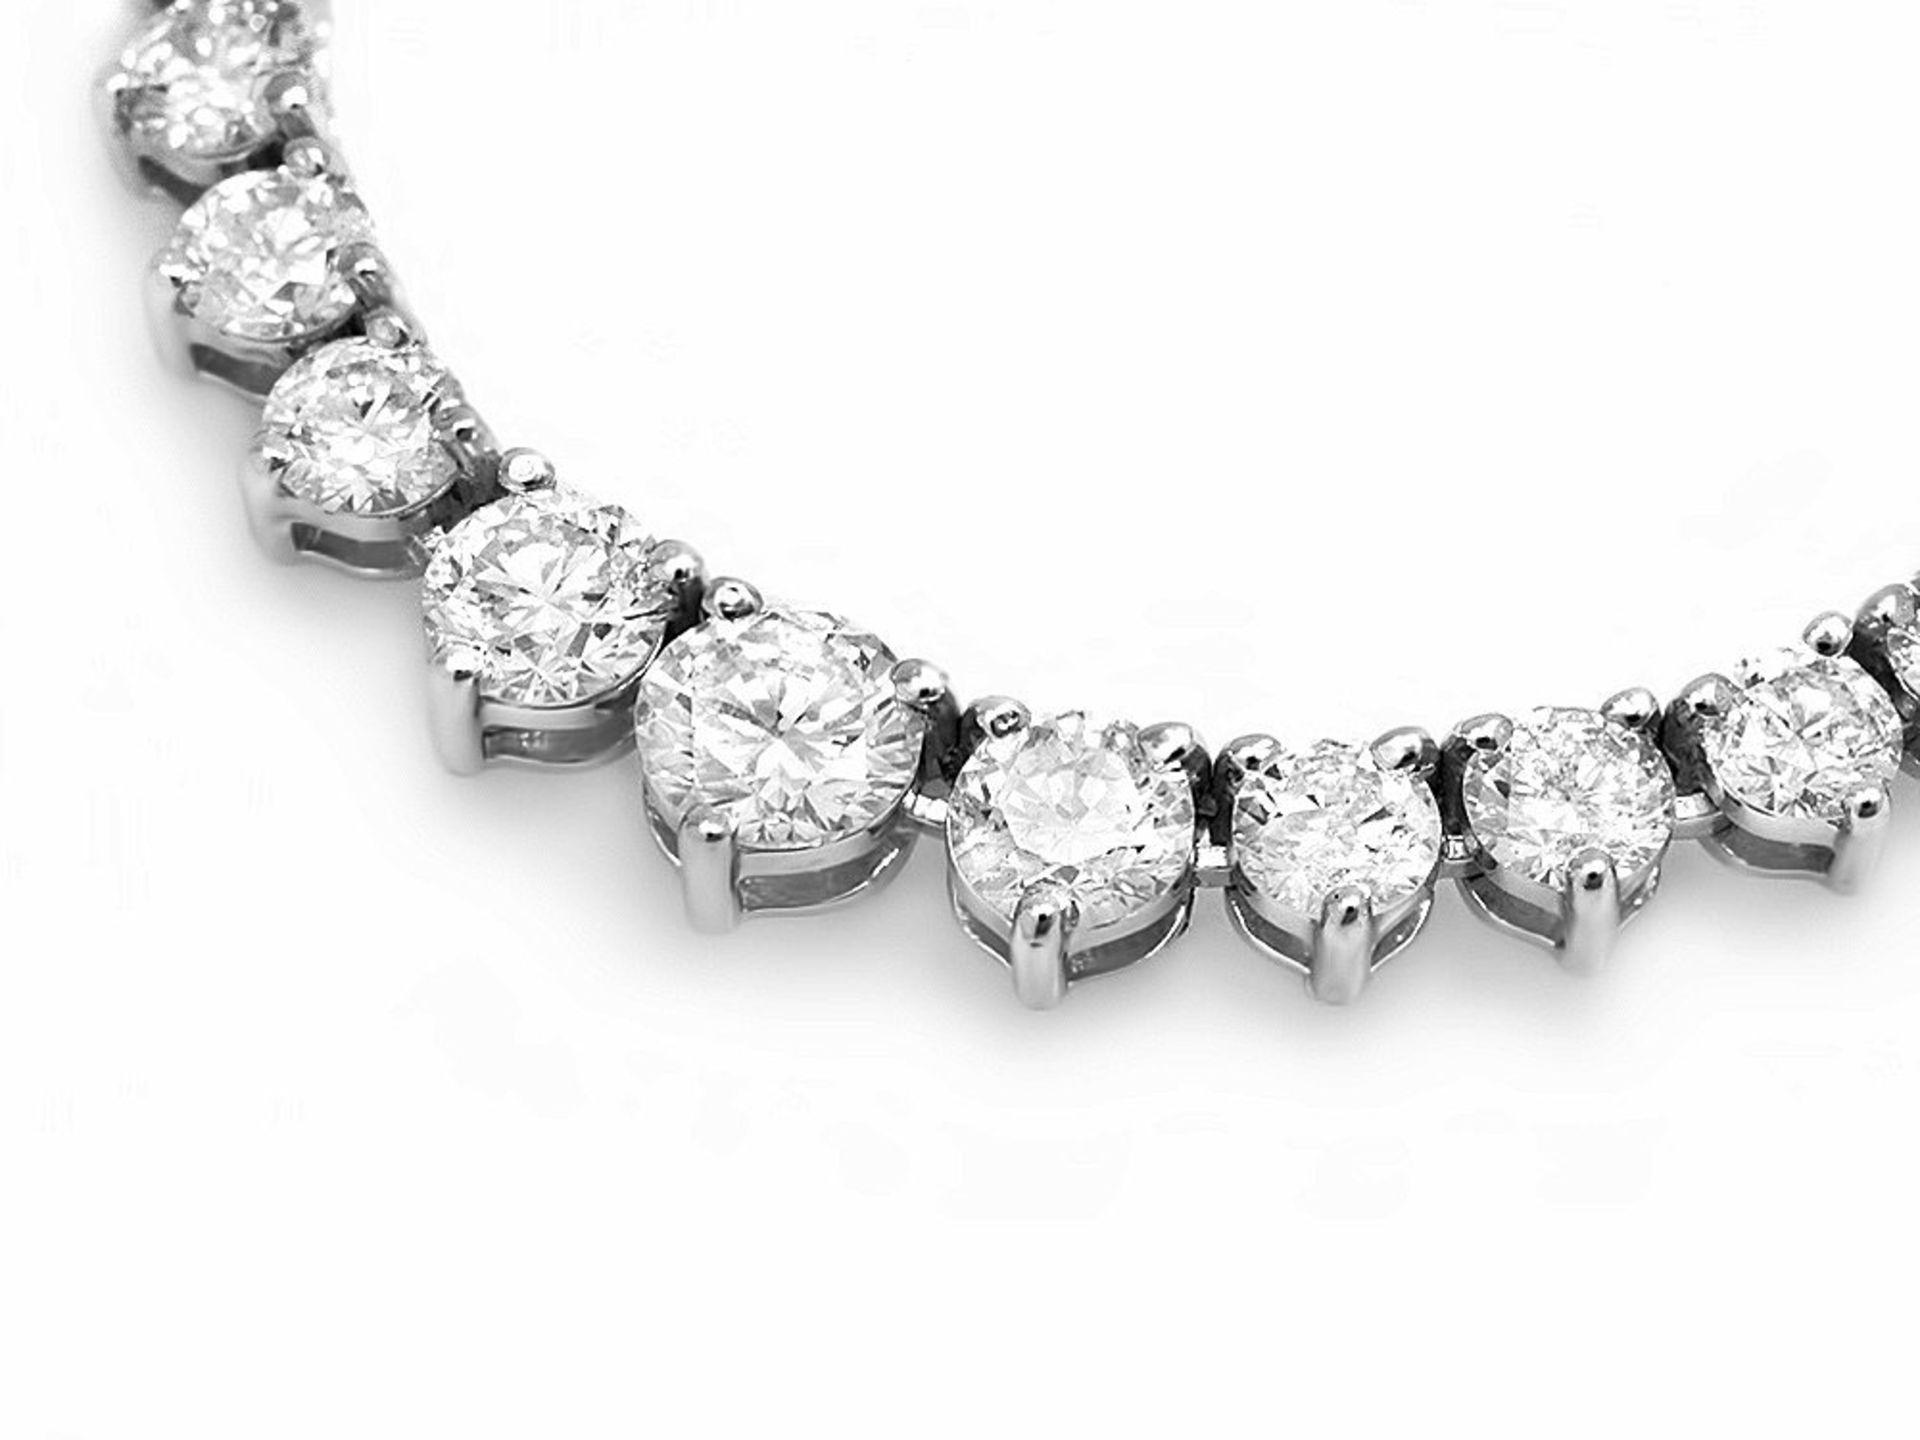 18k White Gold 9.00ct Diamond Necklace - Image 3 of 5